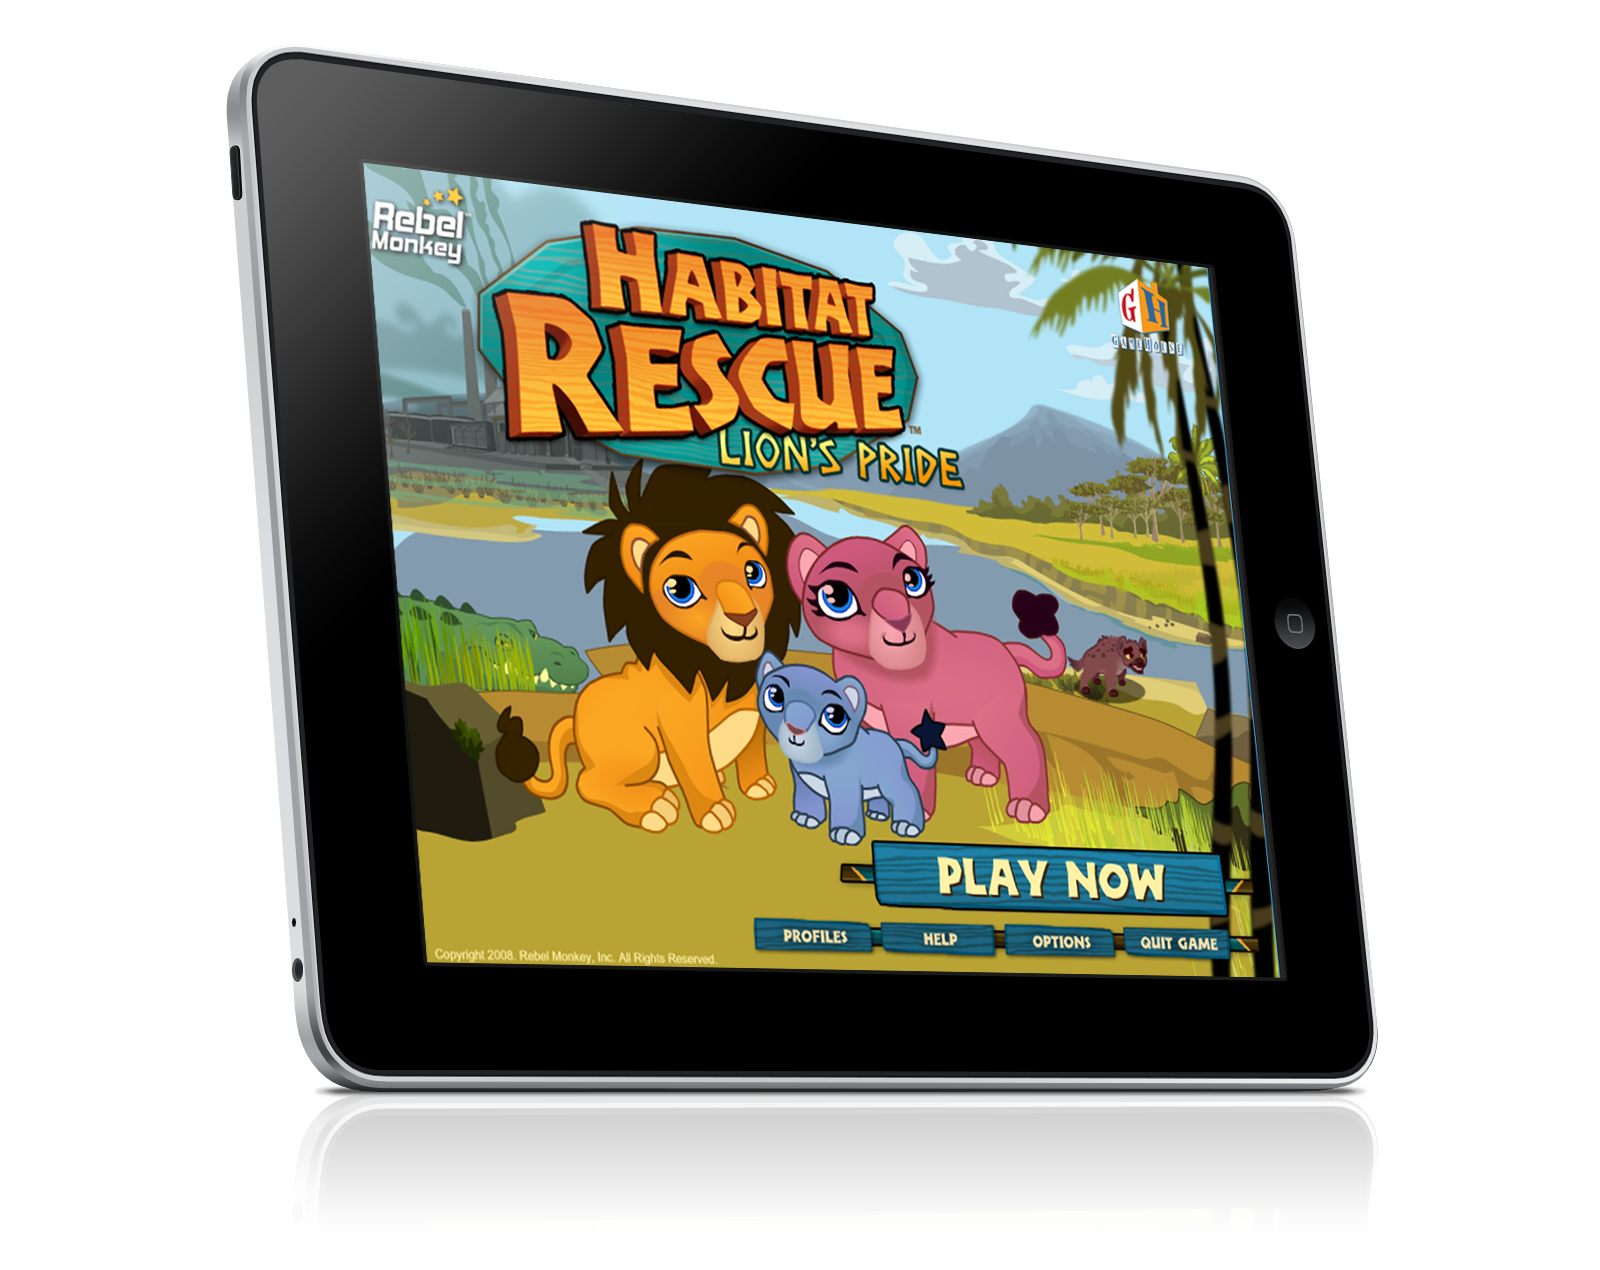 HABITAT RESCUE LION'S PRIDE Home Screen Tablet View